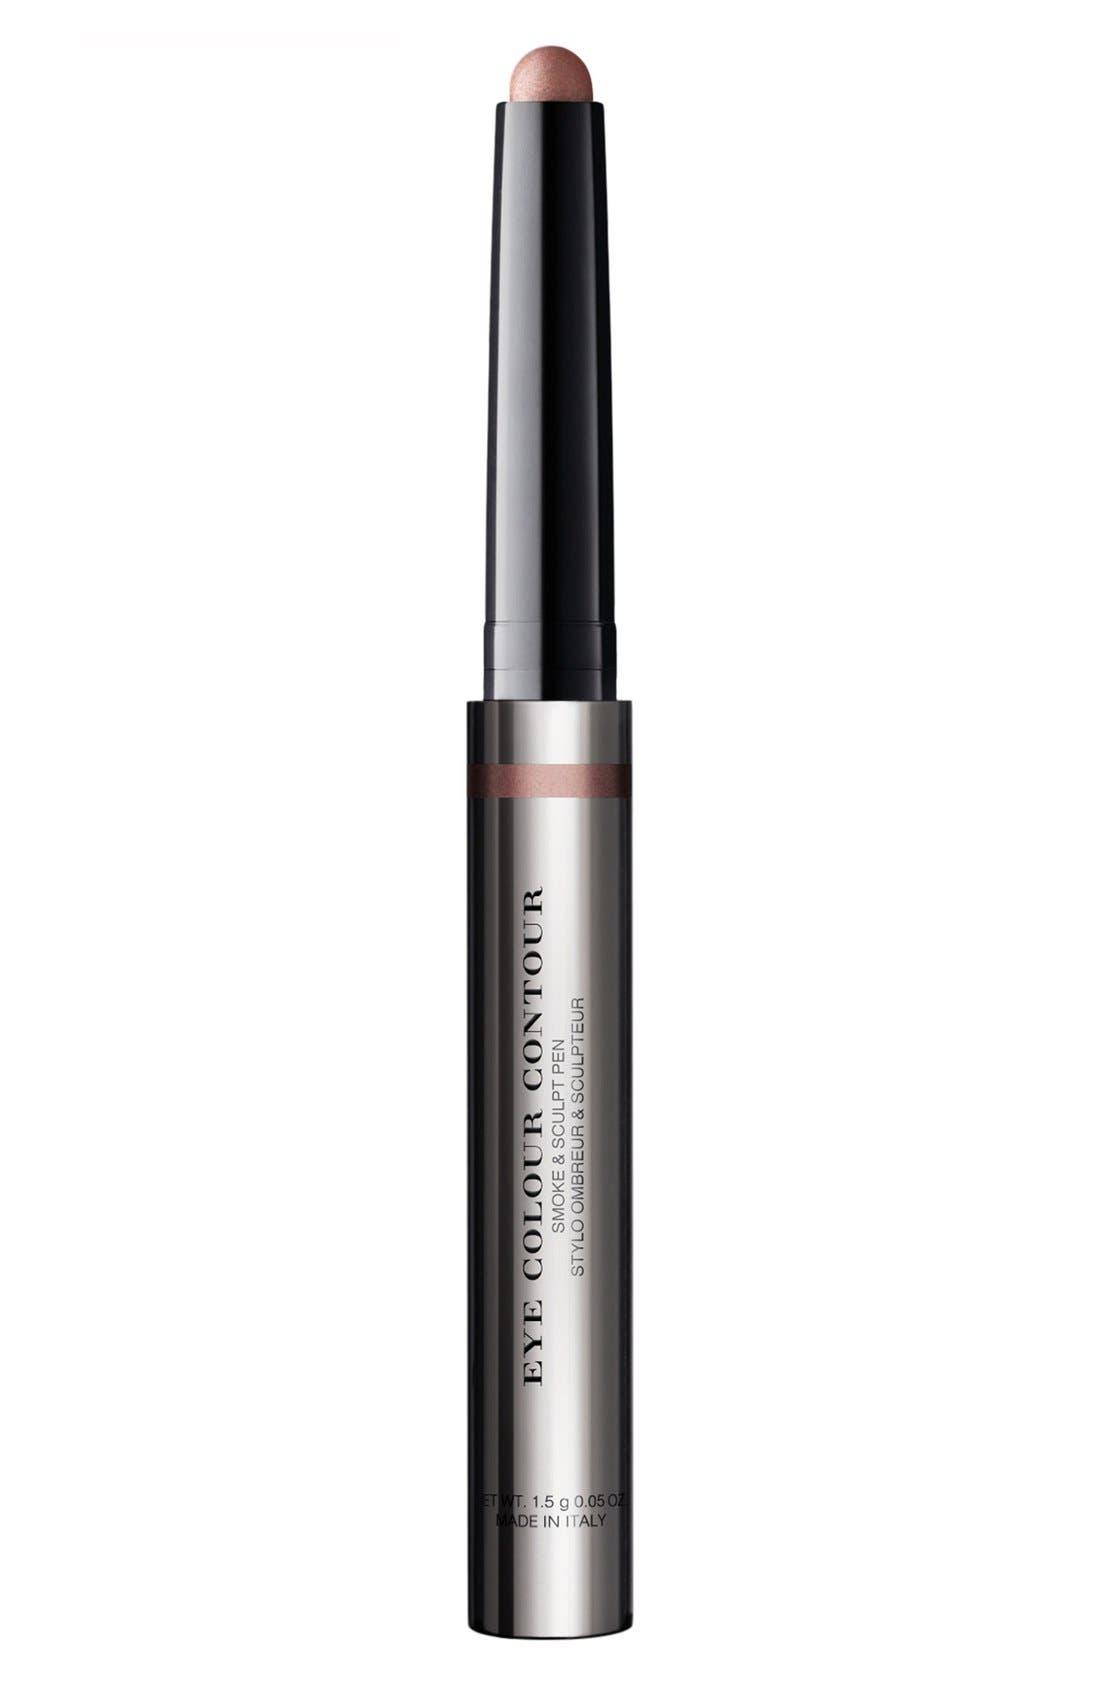 Burberry Beauty Eye Color Contour Smoke & Sculpt Pen